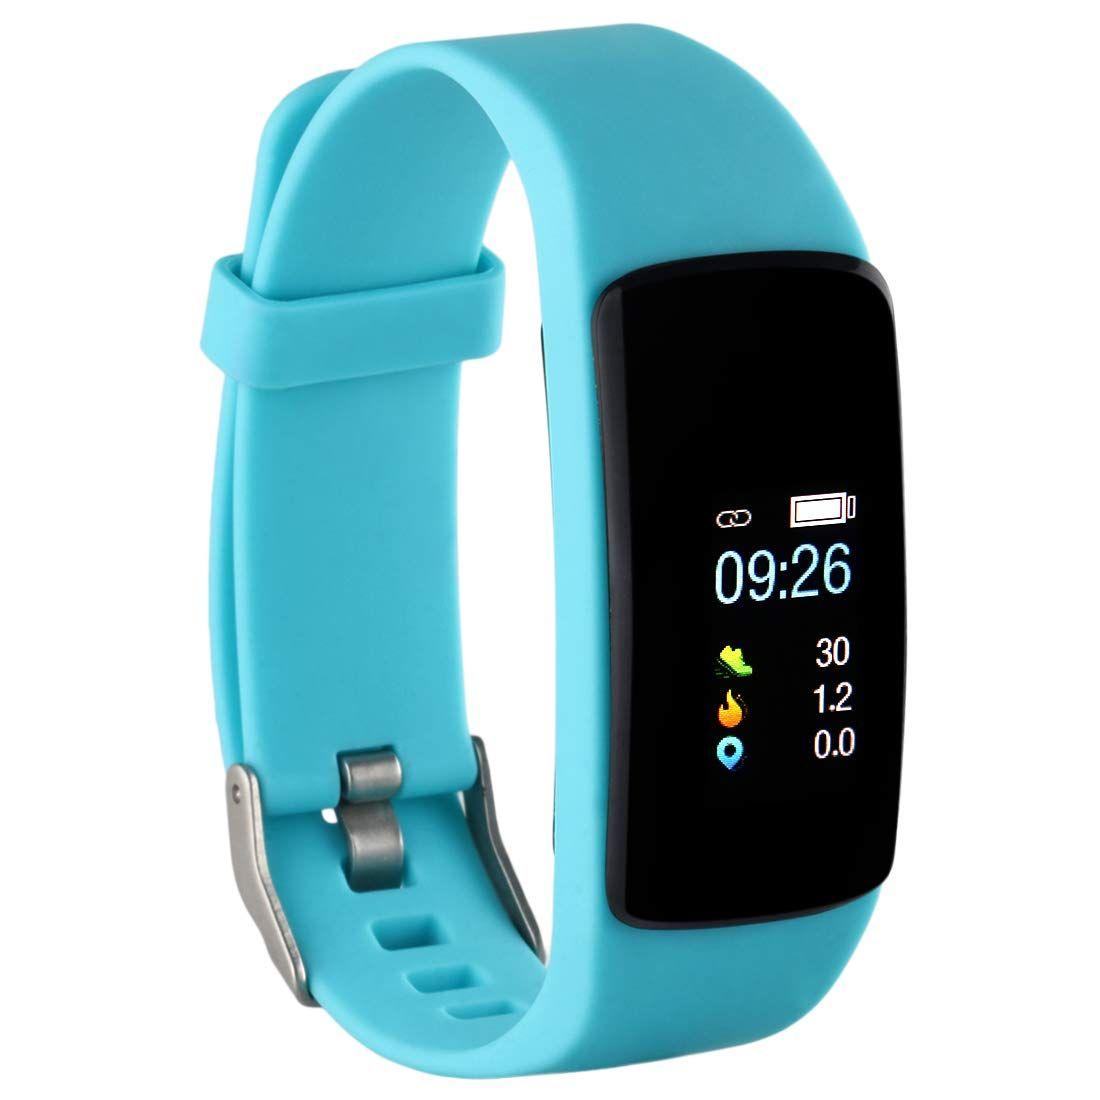 images?q=tbn:ANd9GcQh_l3eQ5xwiPy07kGEXjmjgmBKBRB7H2mRxCGhv1tFWg5c_mWT Smart Watch Bw8z